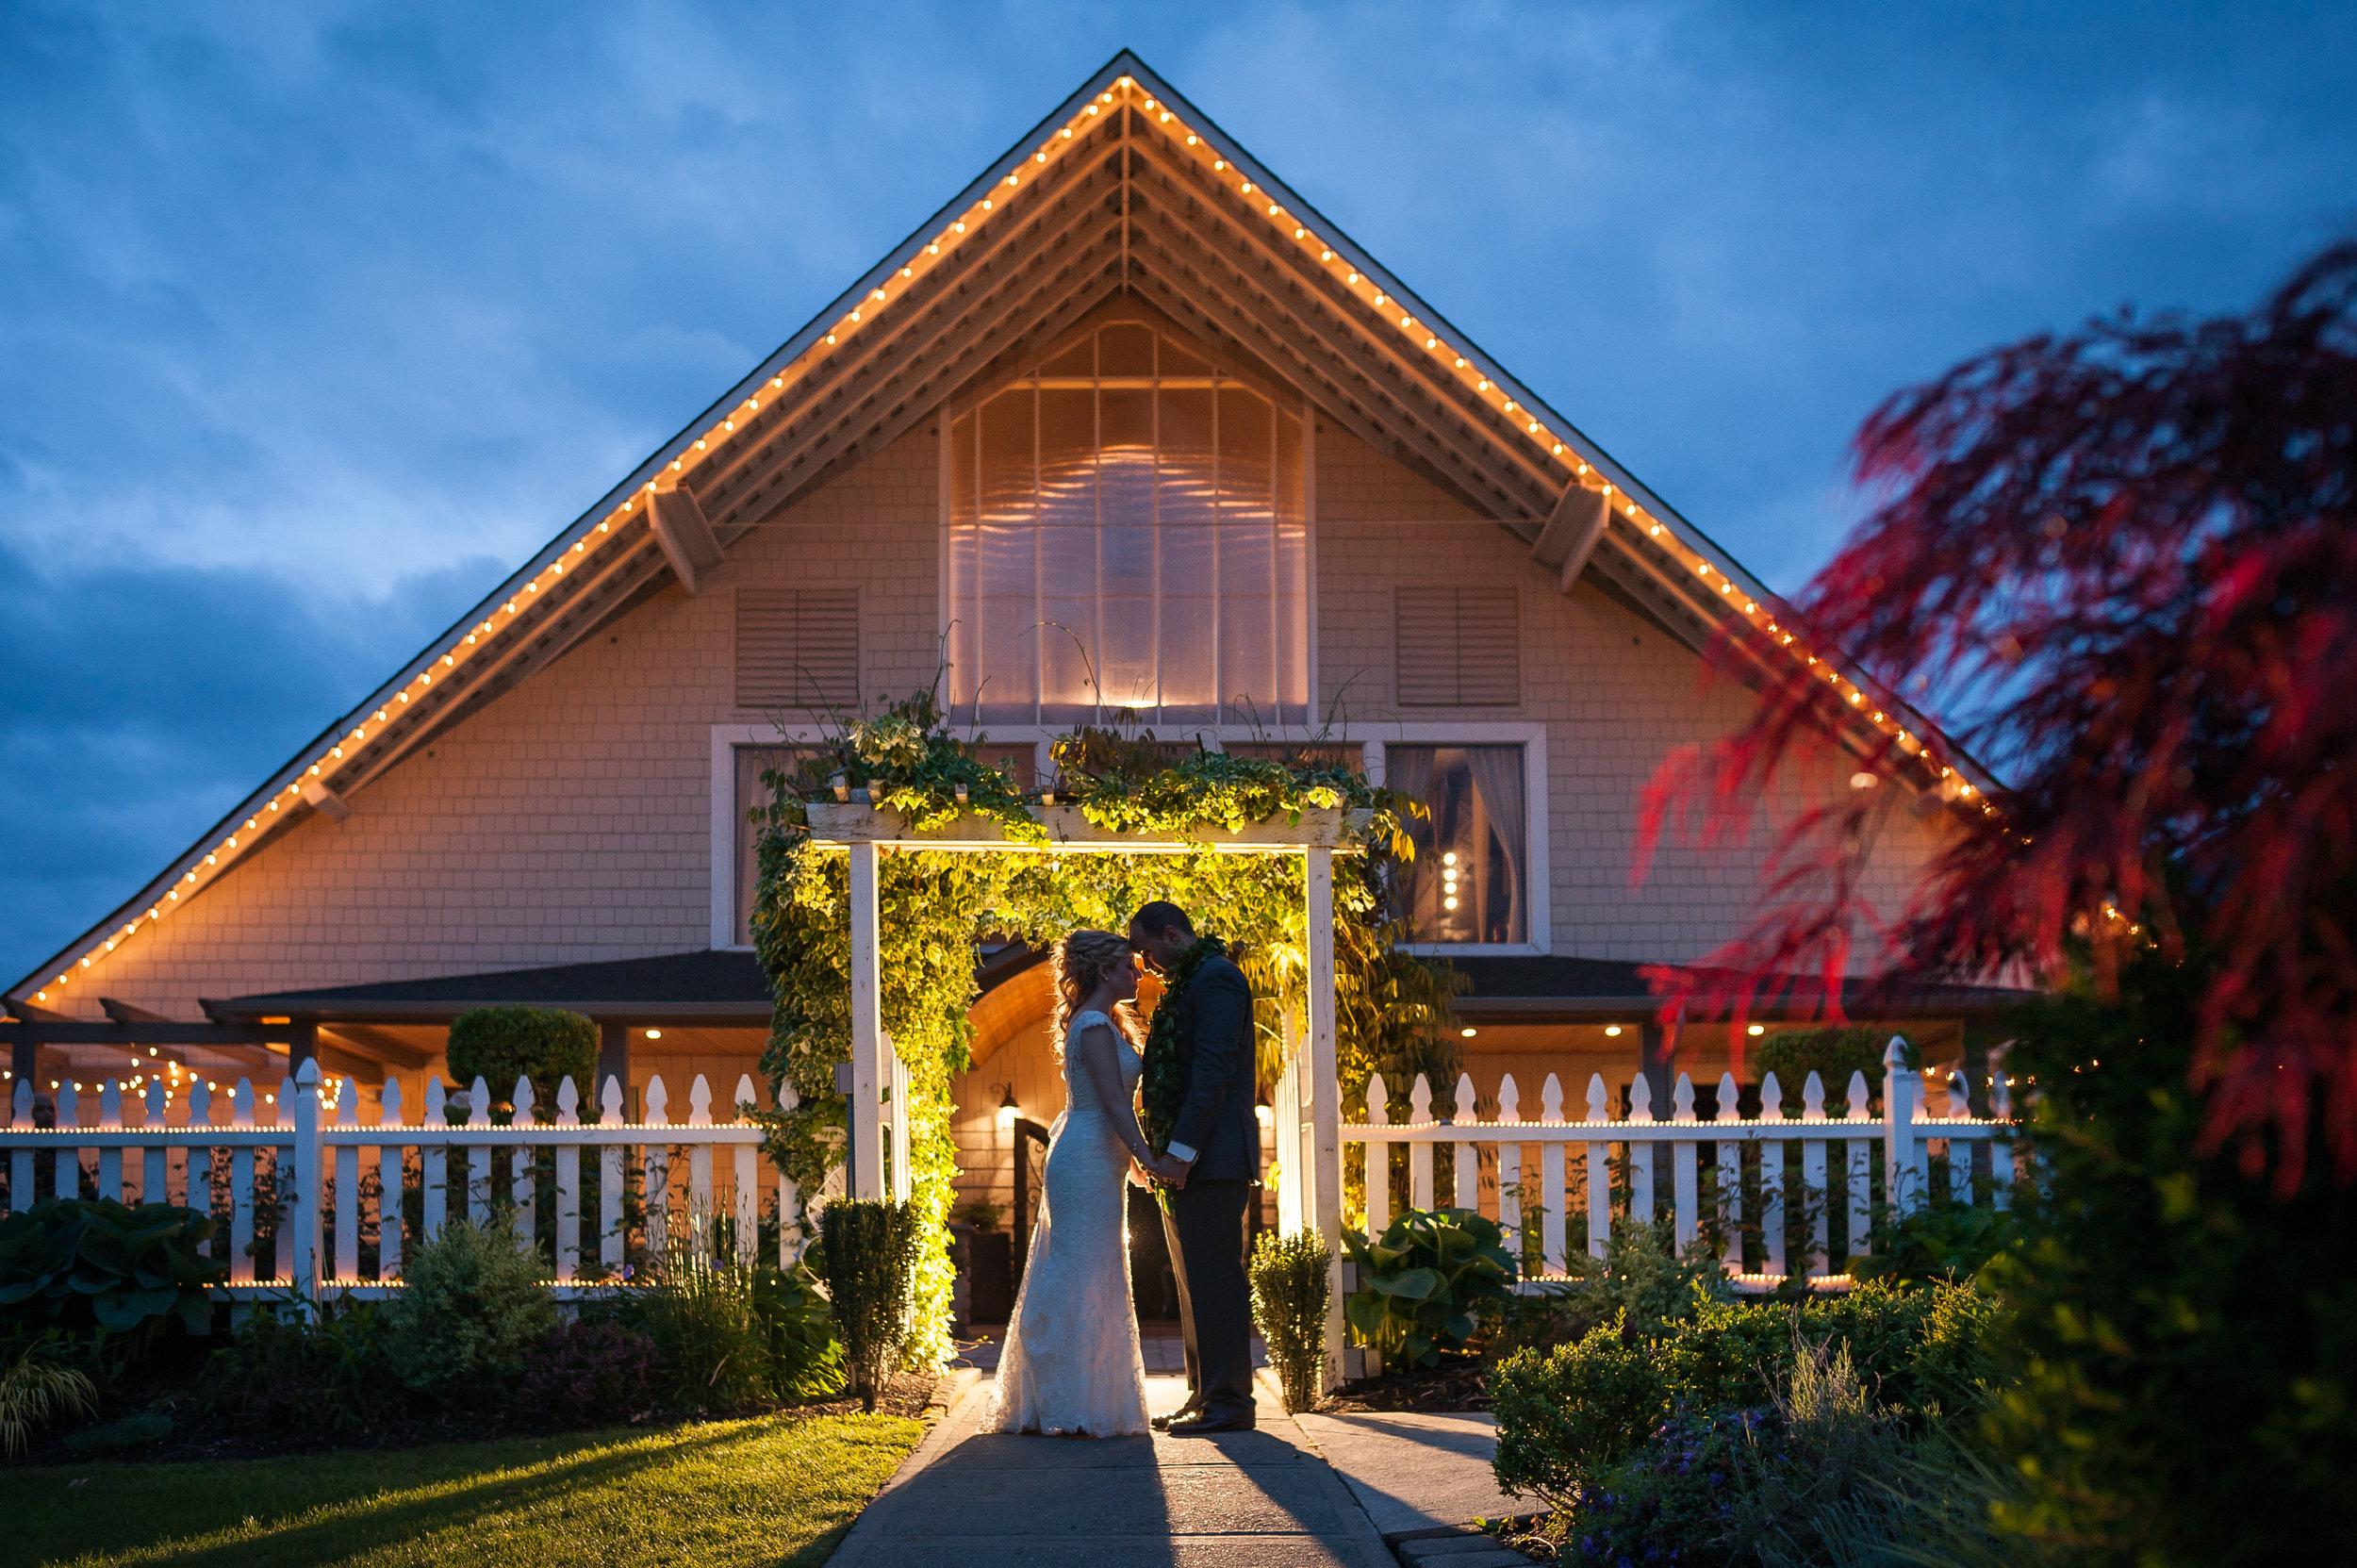 Kelly&Elliot-Wedding-Bride&Groom-OriginalCollection-119.jpg